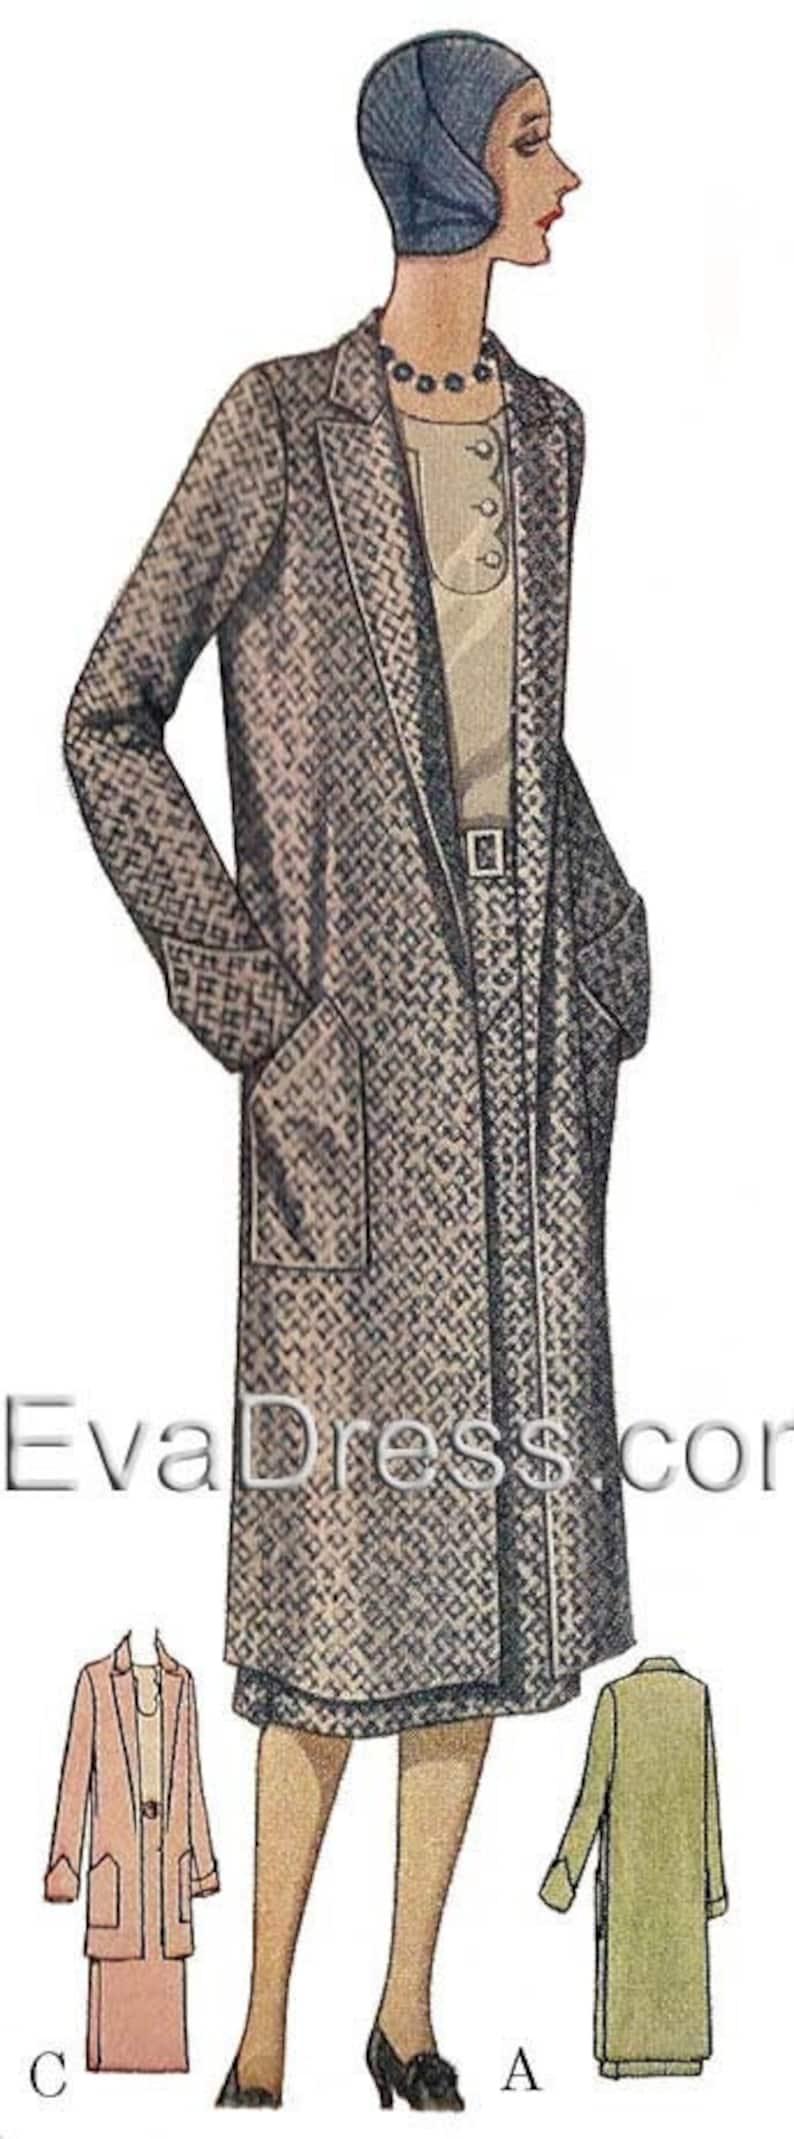 1930s Sewing Patterns- Dresses, Pants, Tops 1929 Coat Pattern by EvaDress $17.00 AT vintagedancer.com